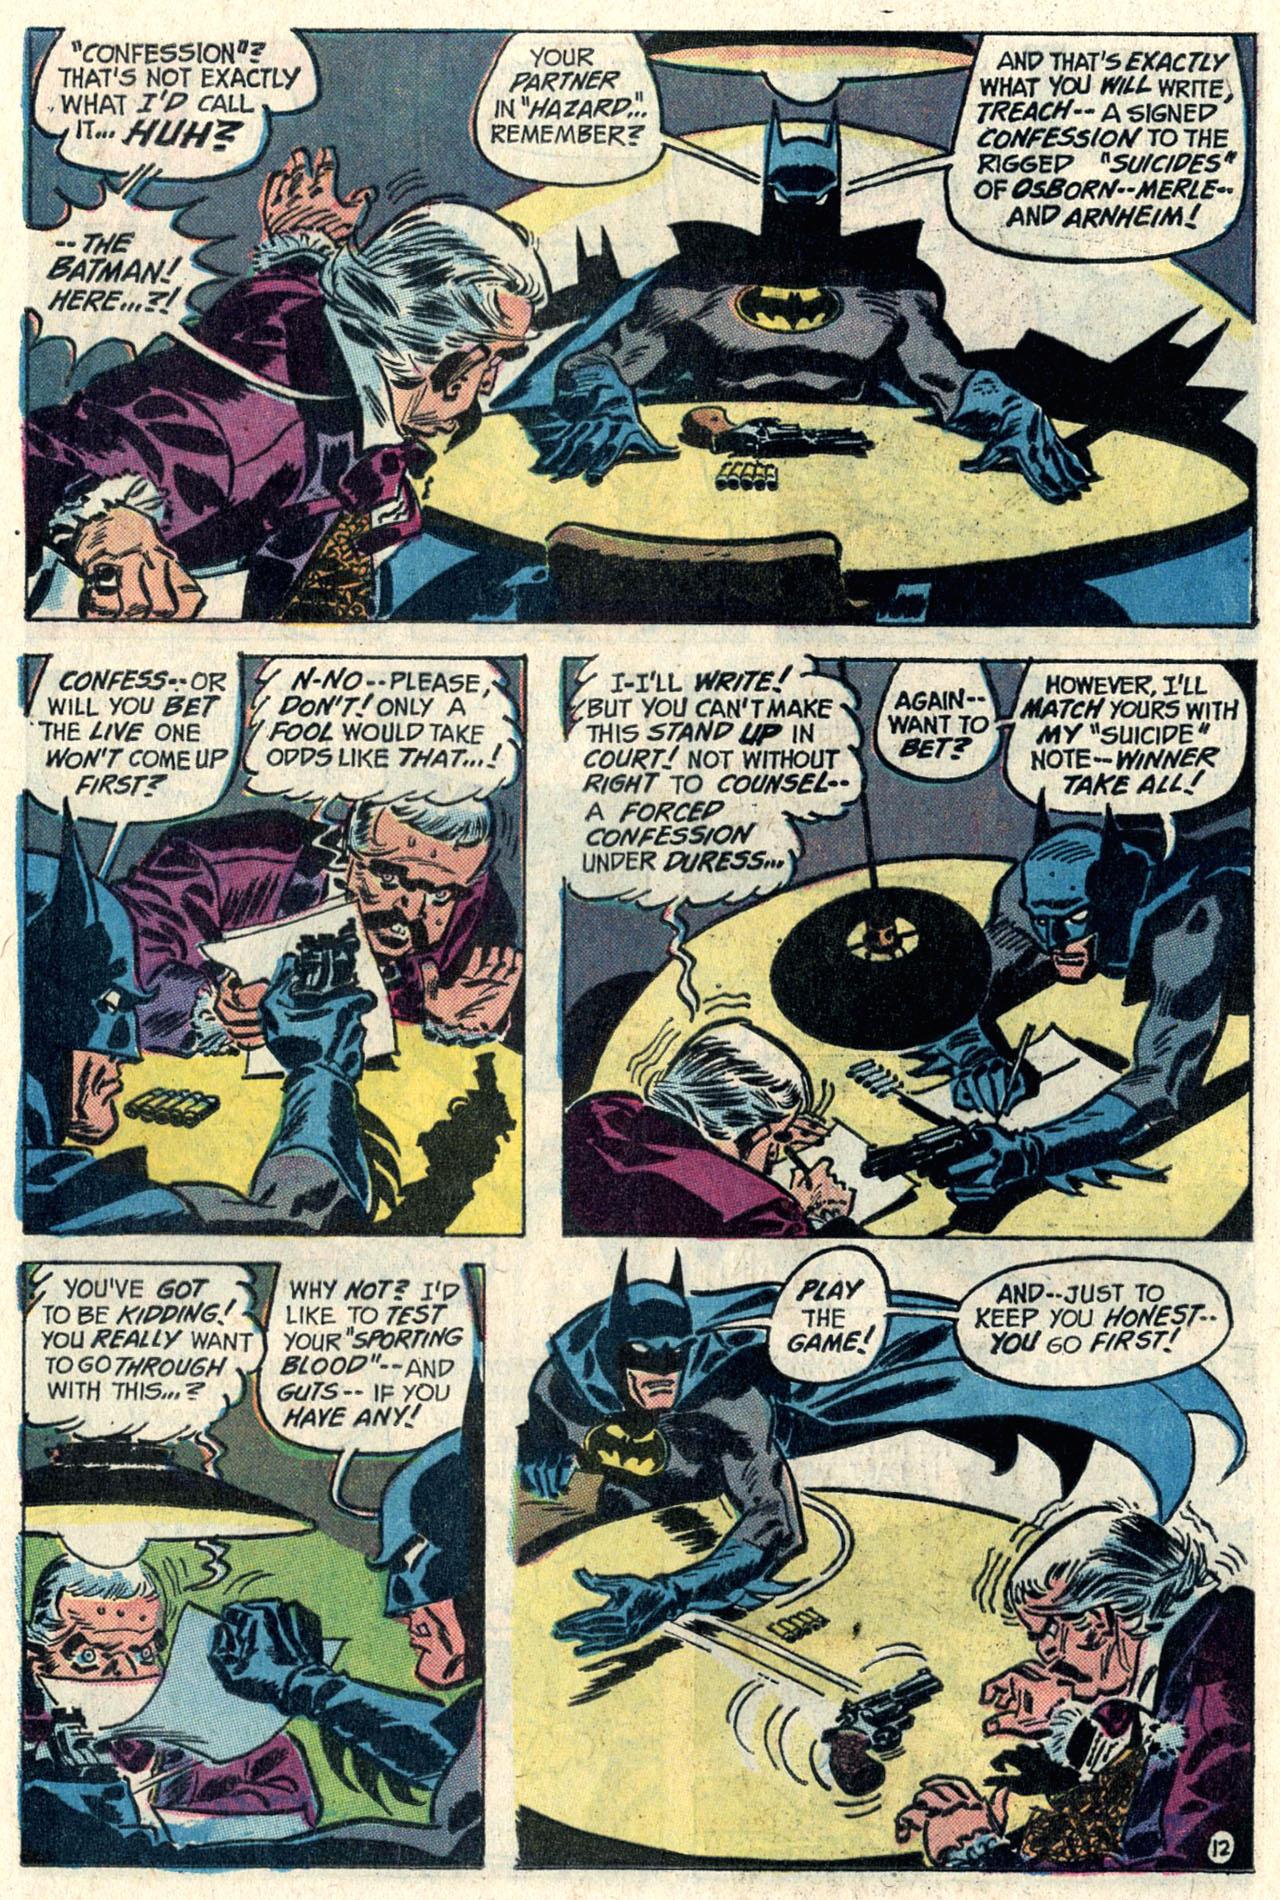 Detective Comics (1937) 426 Page 15